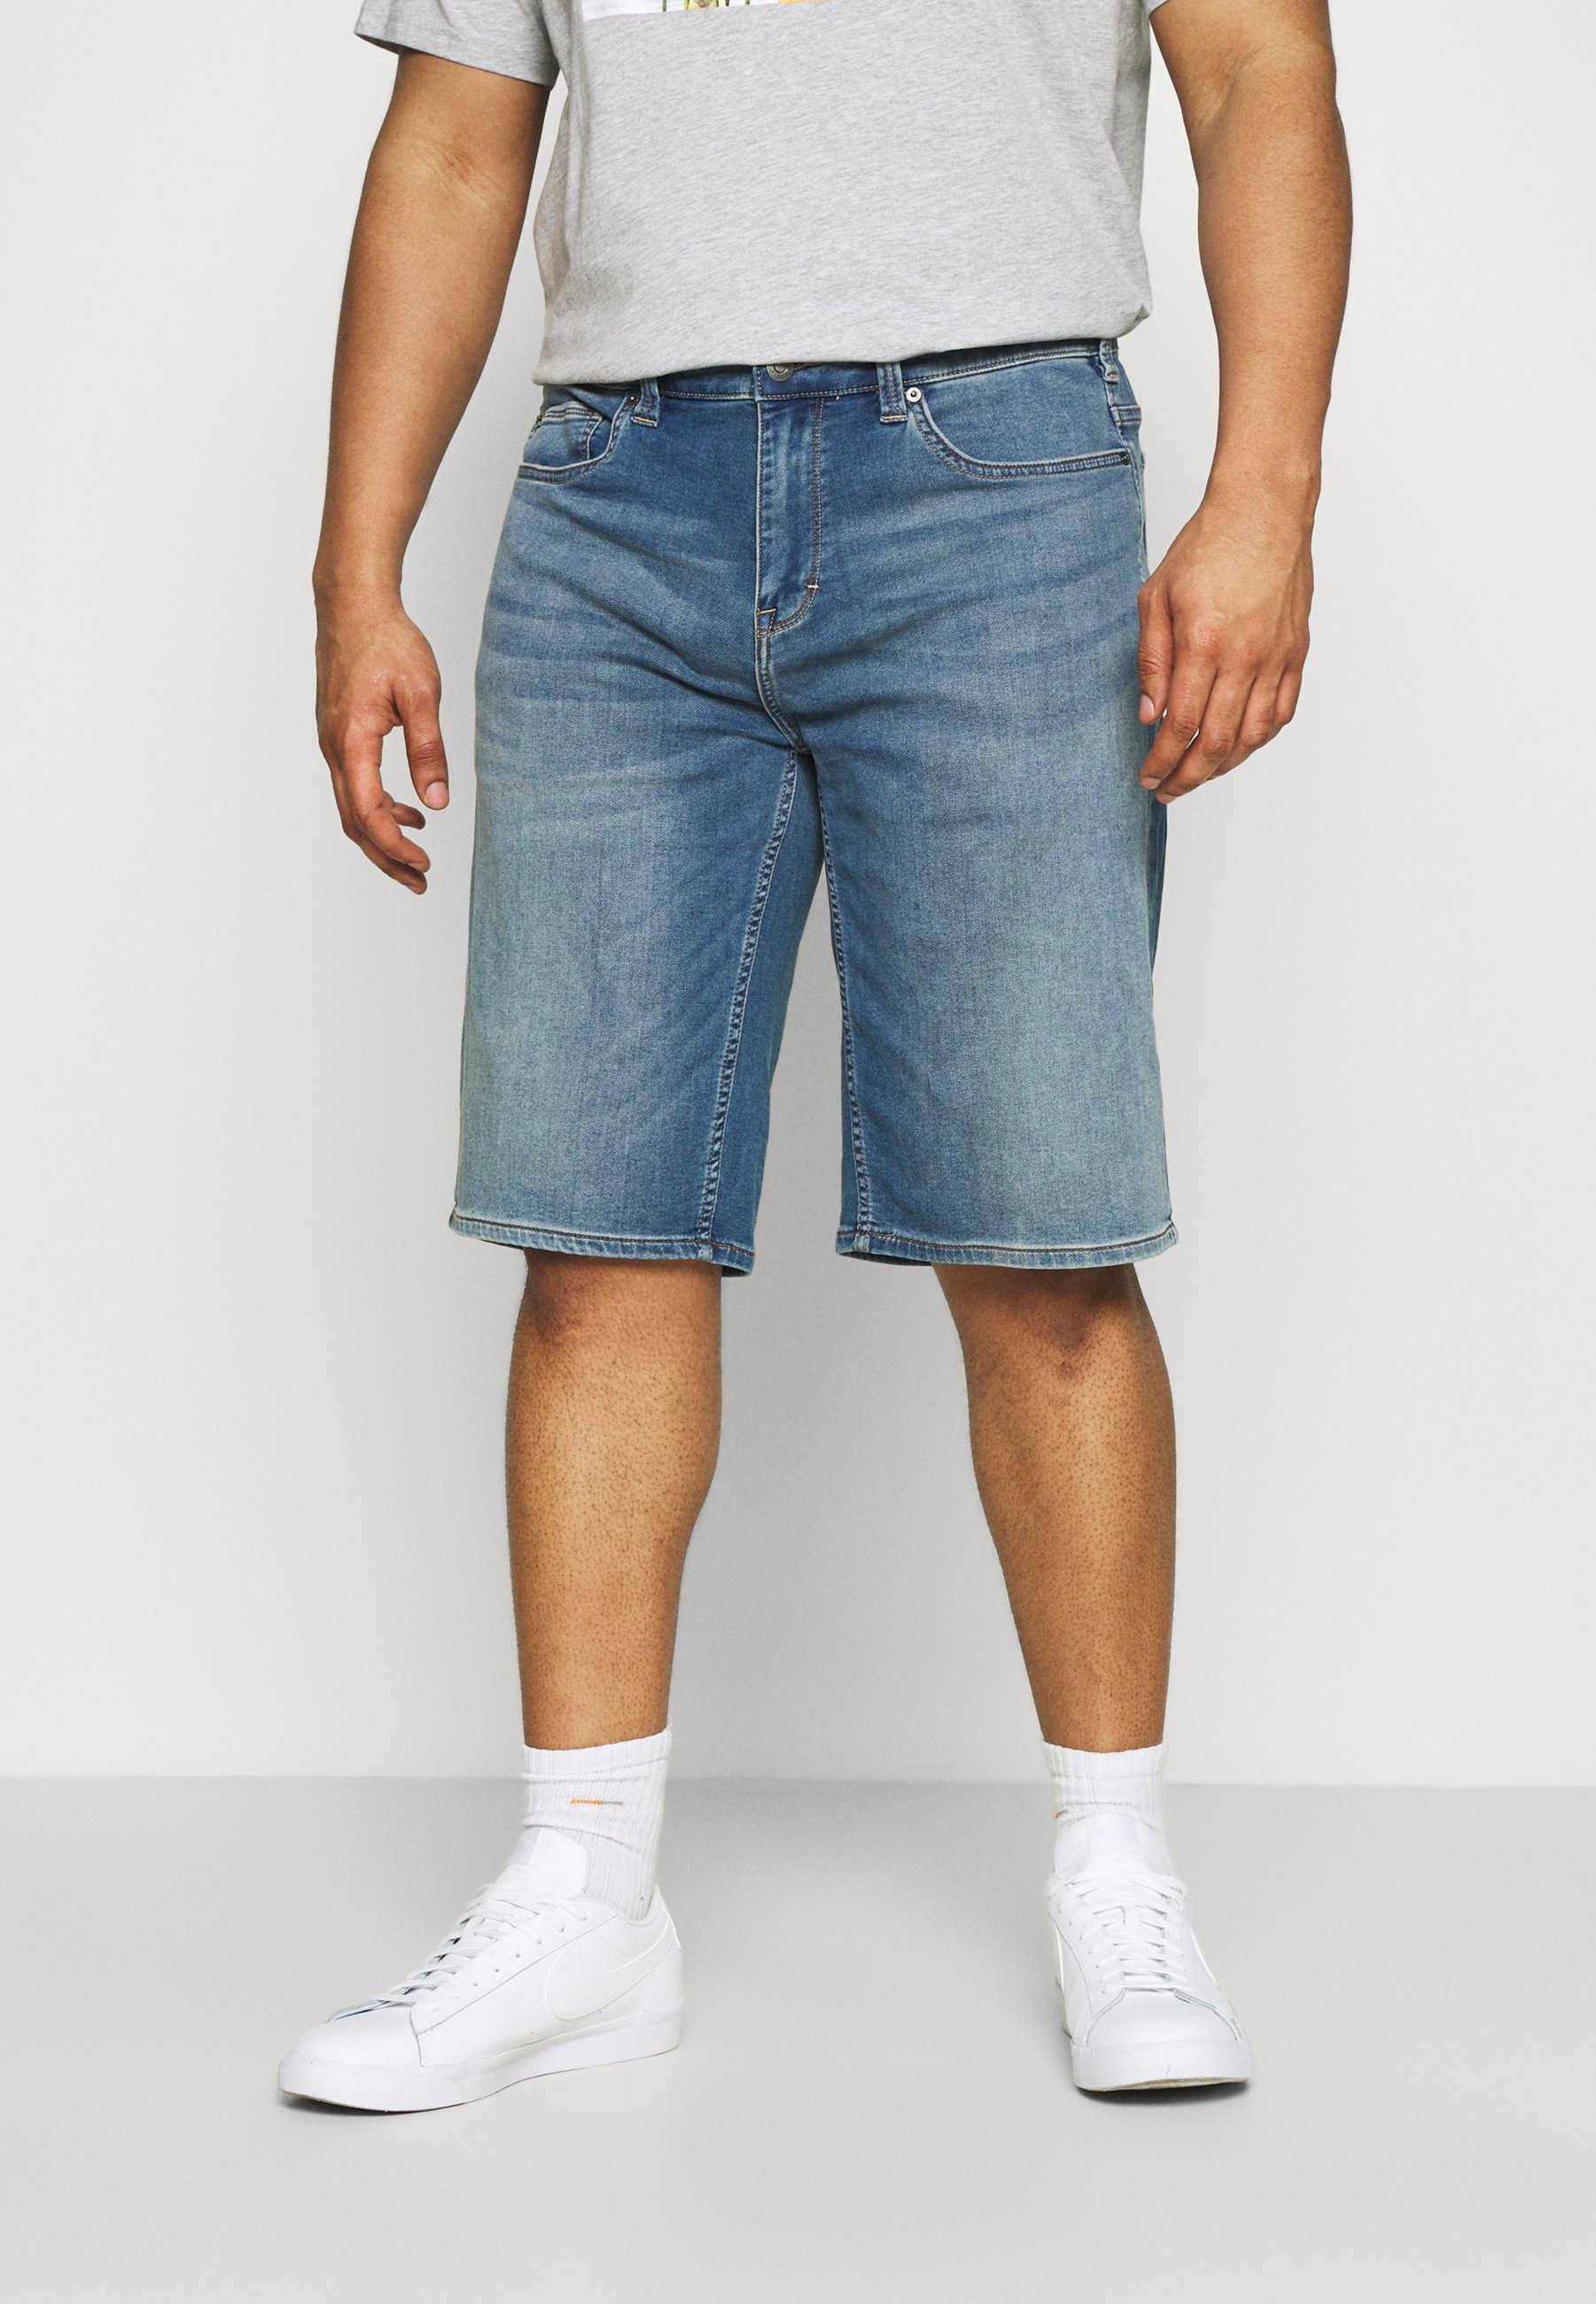 Homme BERMUDA - Short en jean